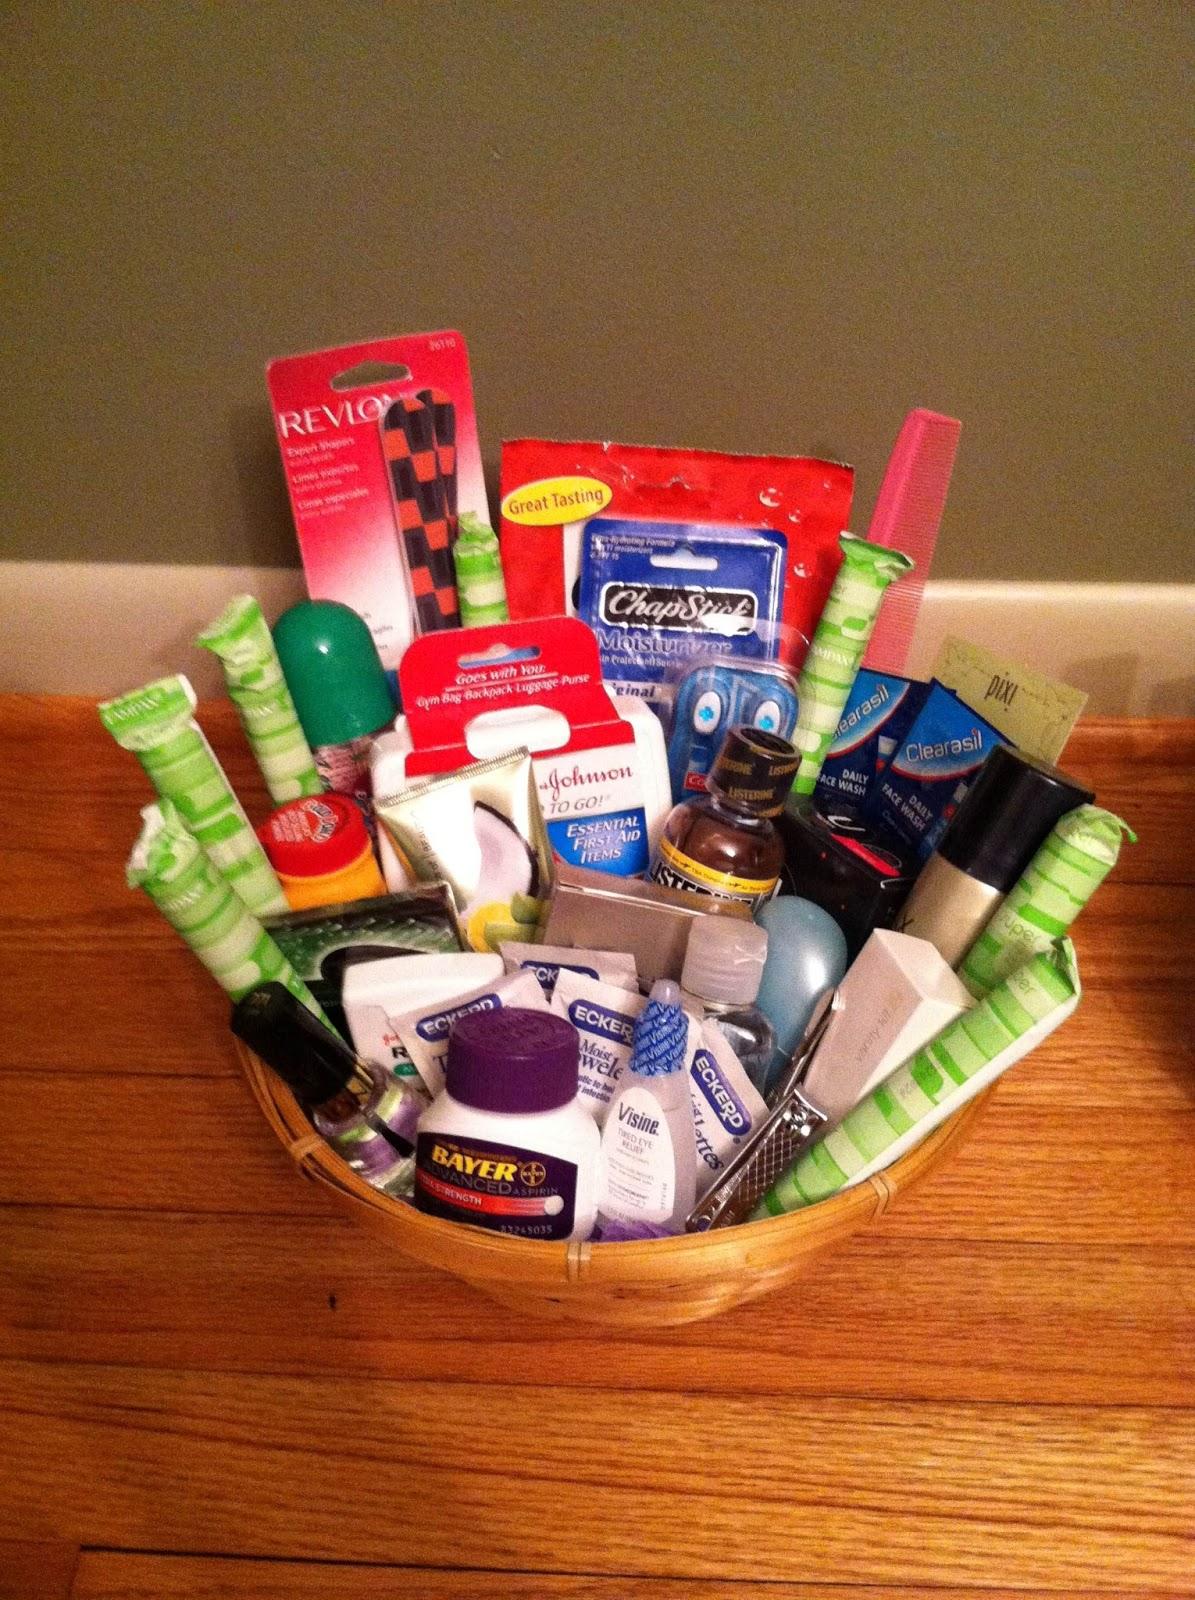 Bathroom Baskets For Wedding amazing ideas. Bathroom Baskets For Wedding amazing ideas   A1houston com